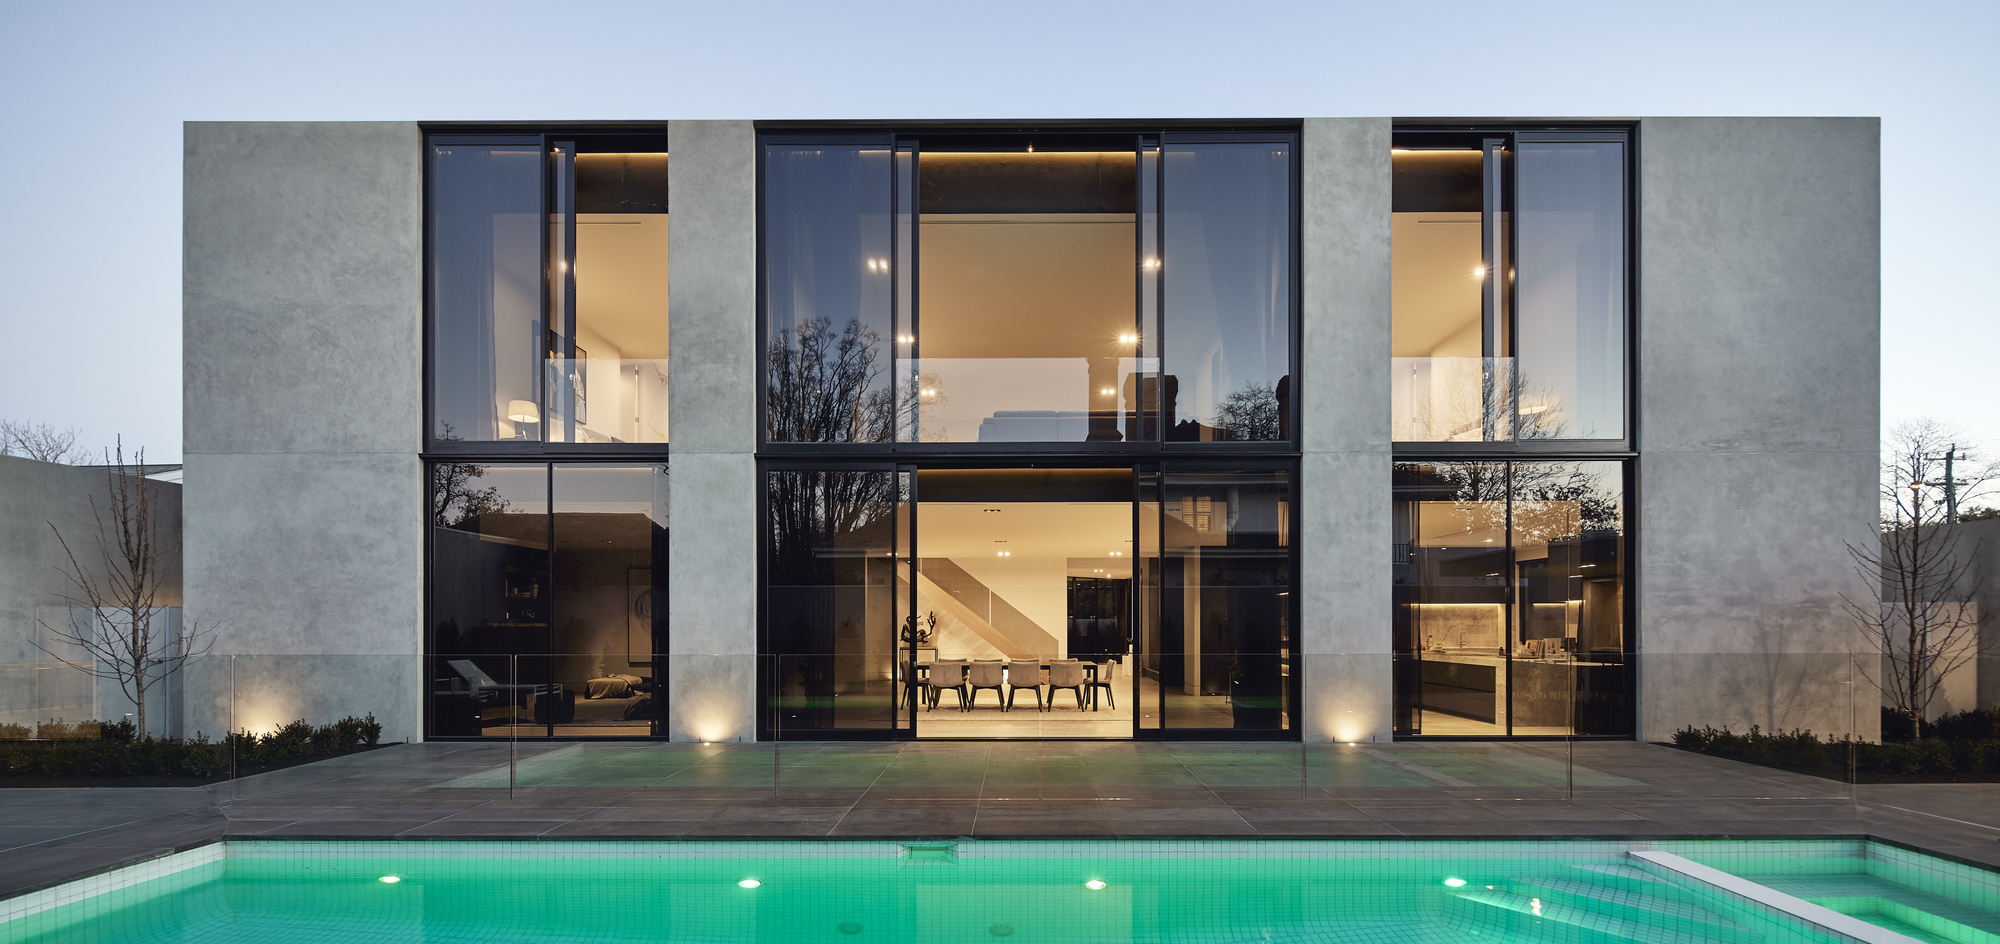 Teringa / FGR Architects